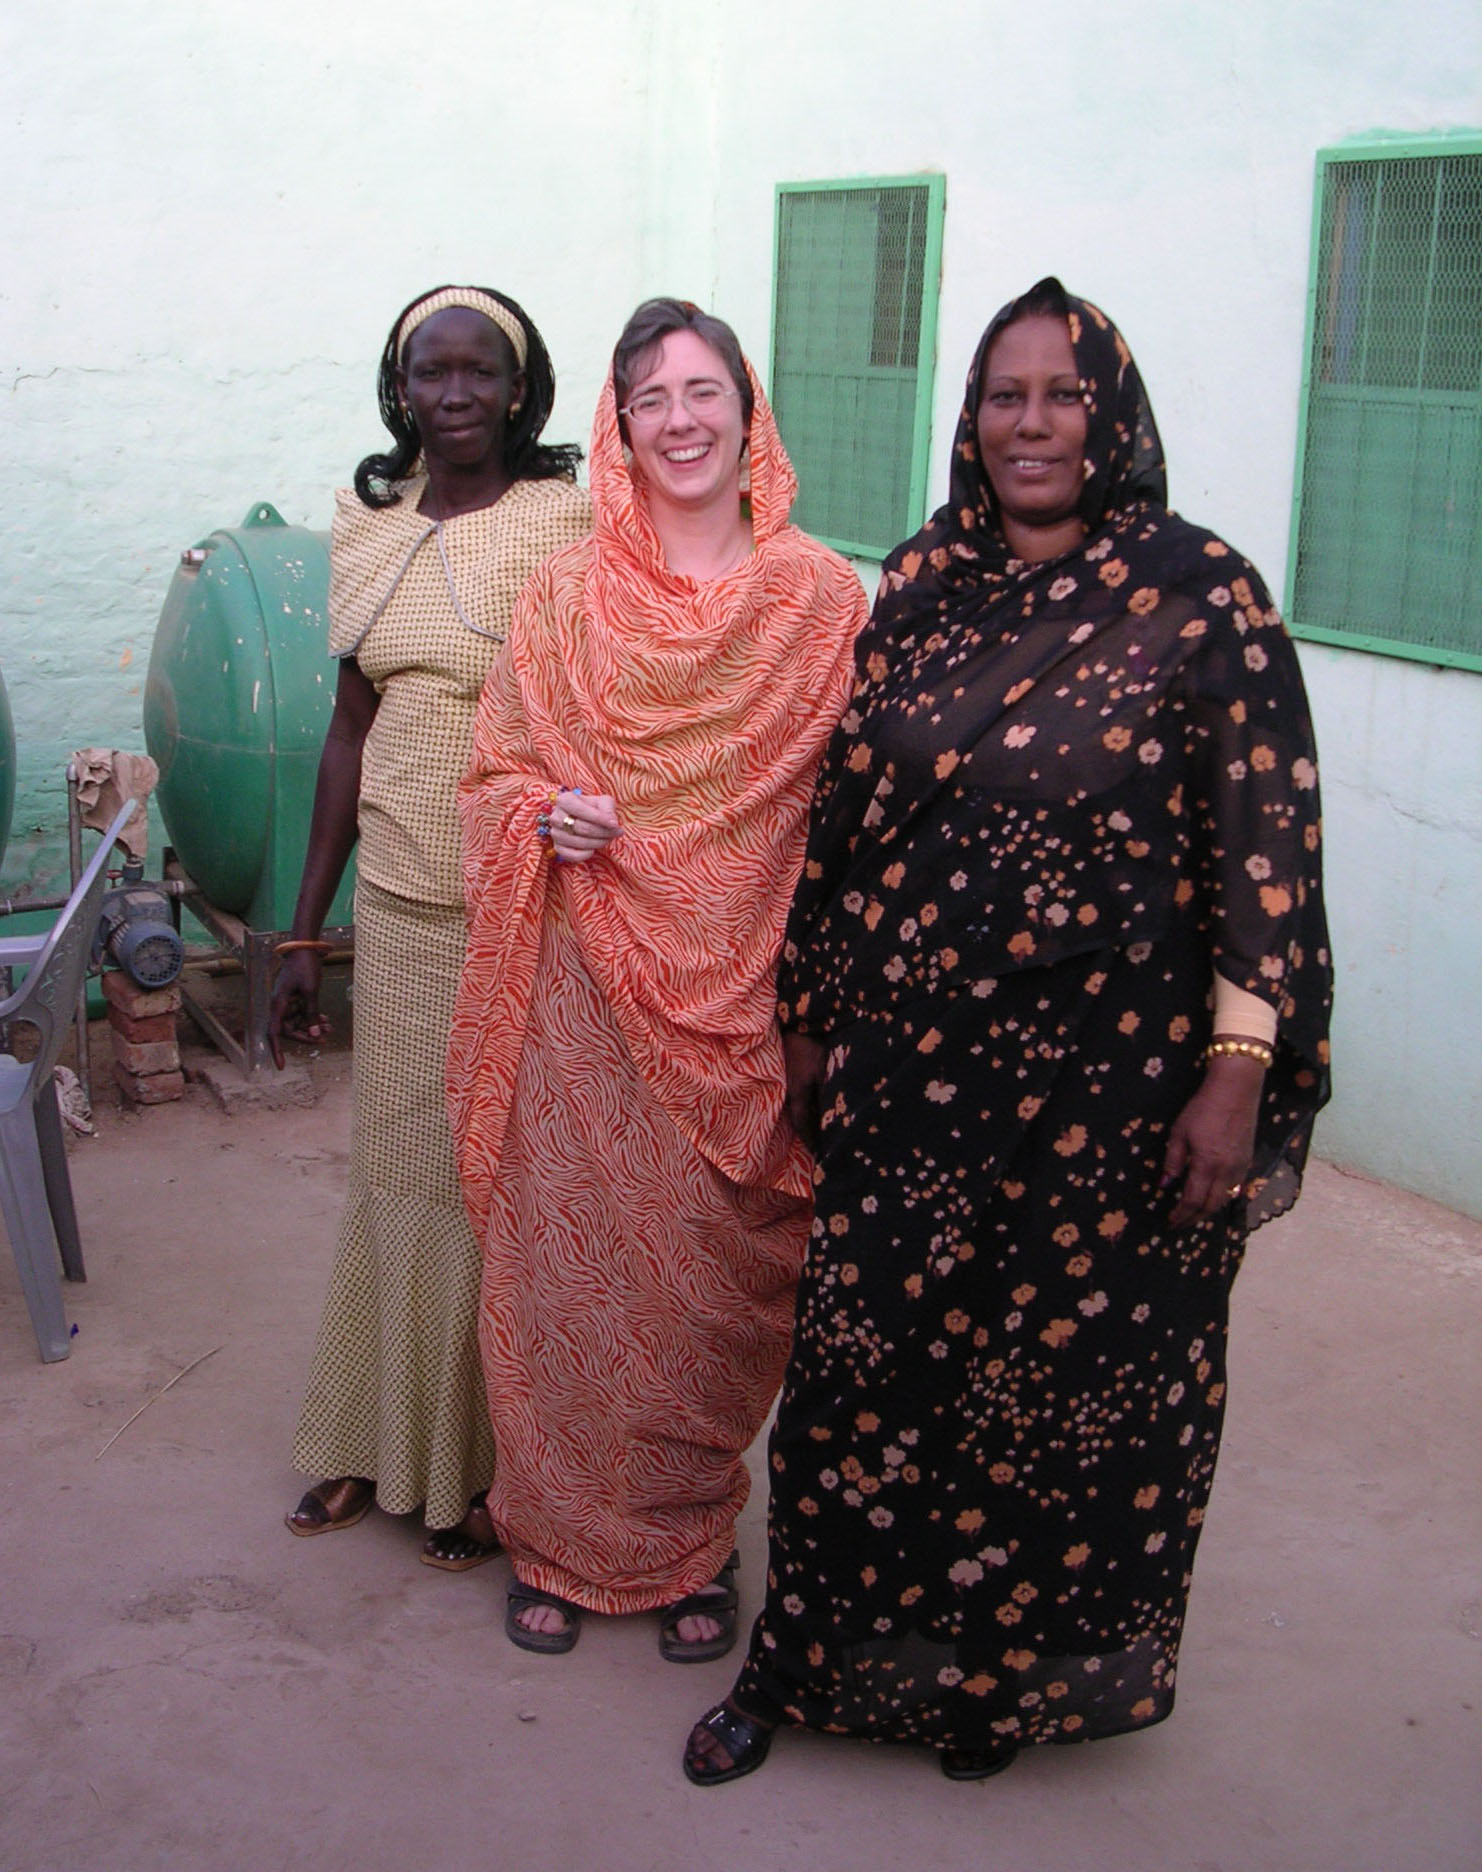 Working with women in Sudan